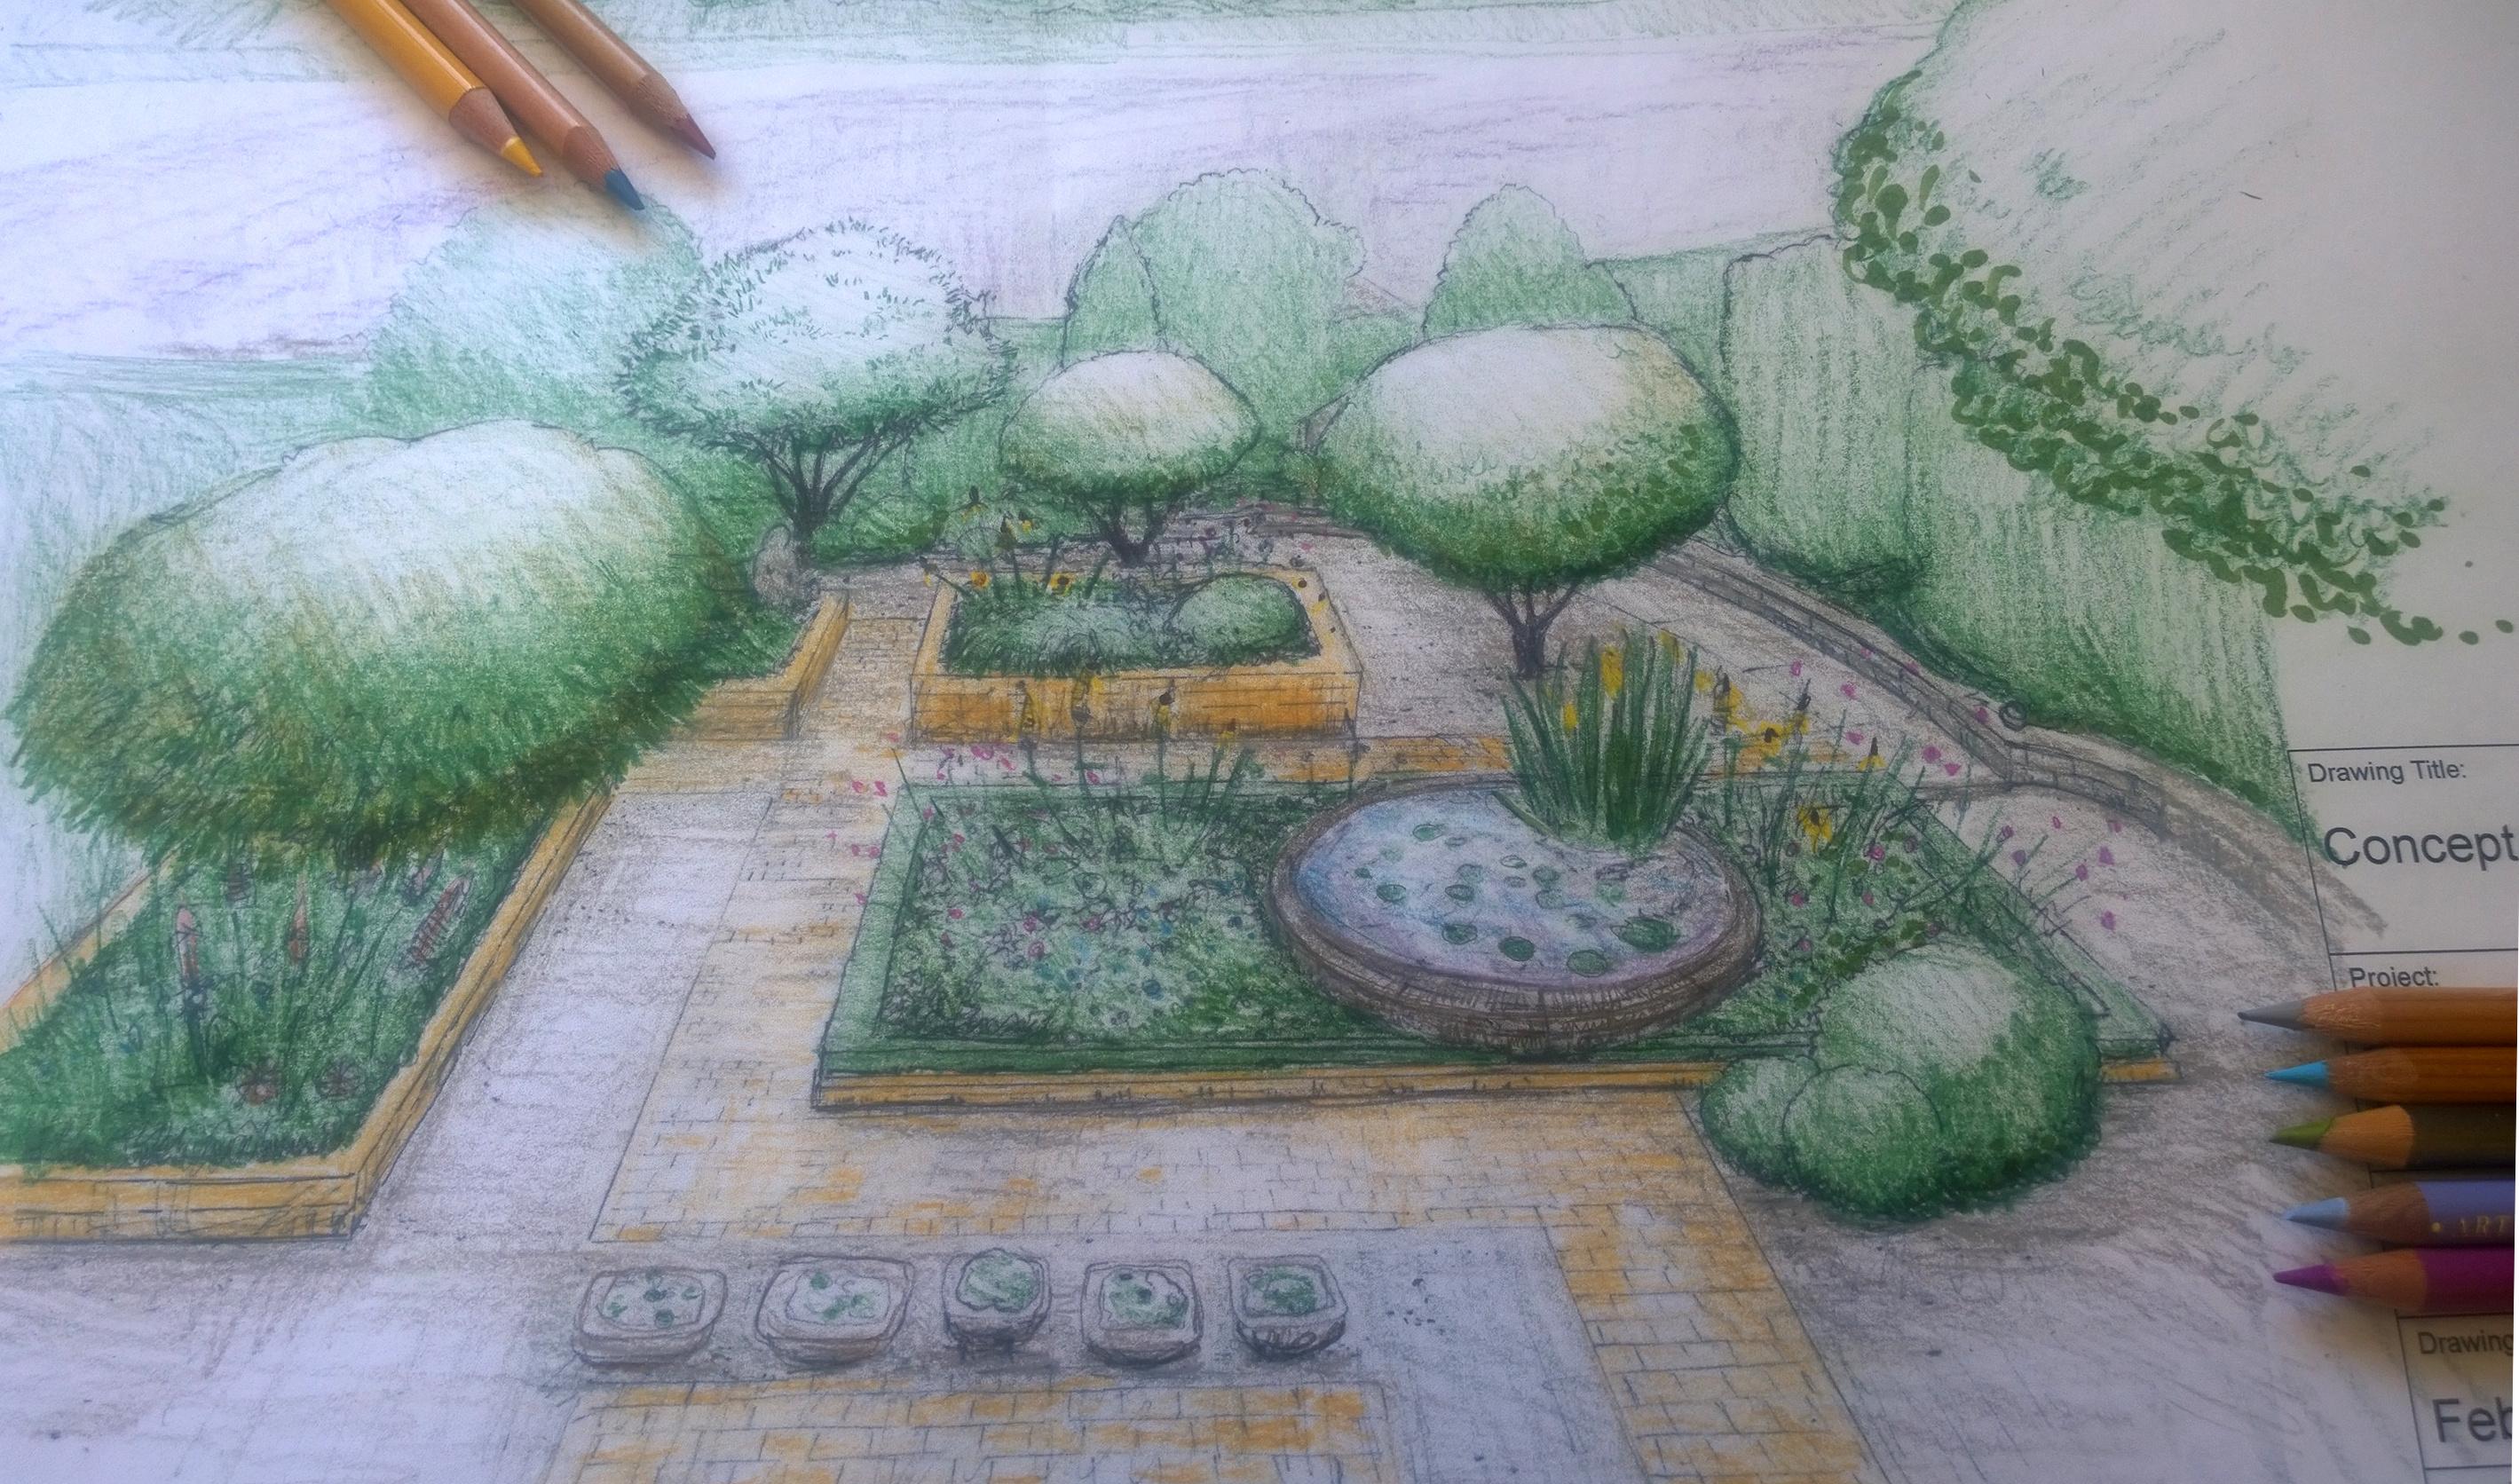 Focus On Garden Design Drawings Earthworks Garden Design